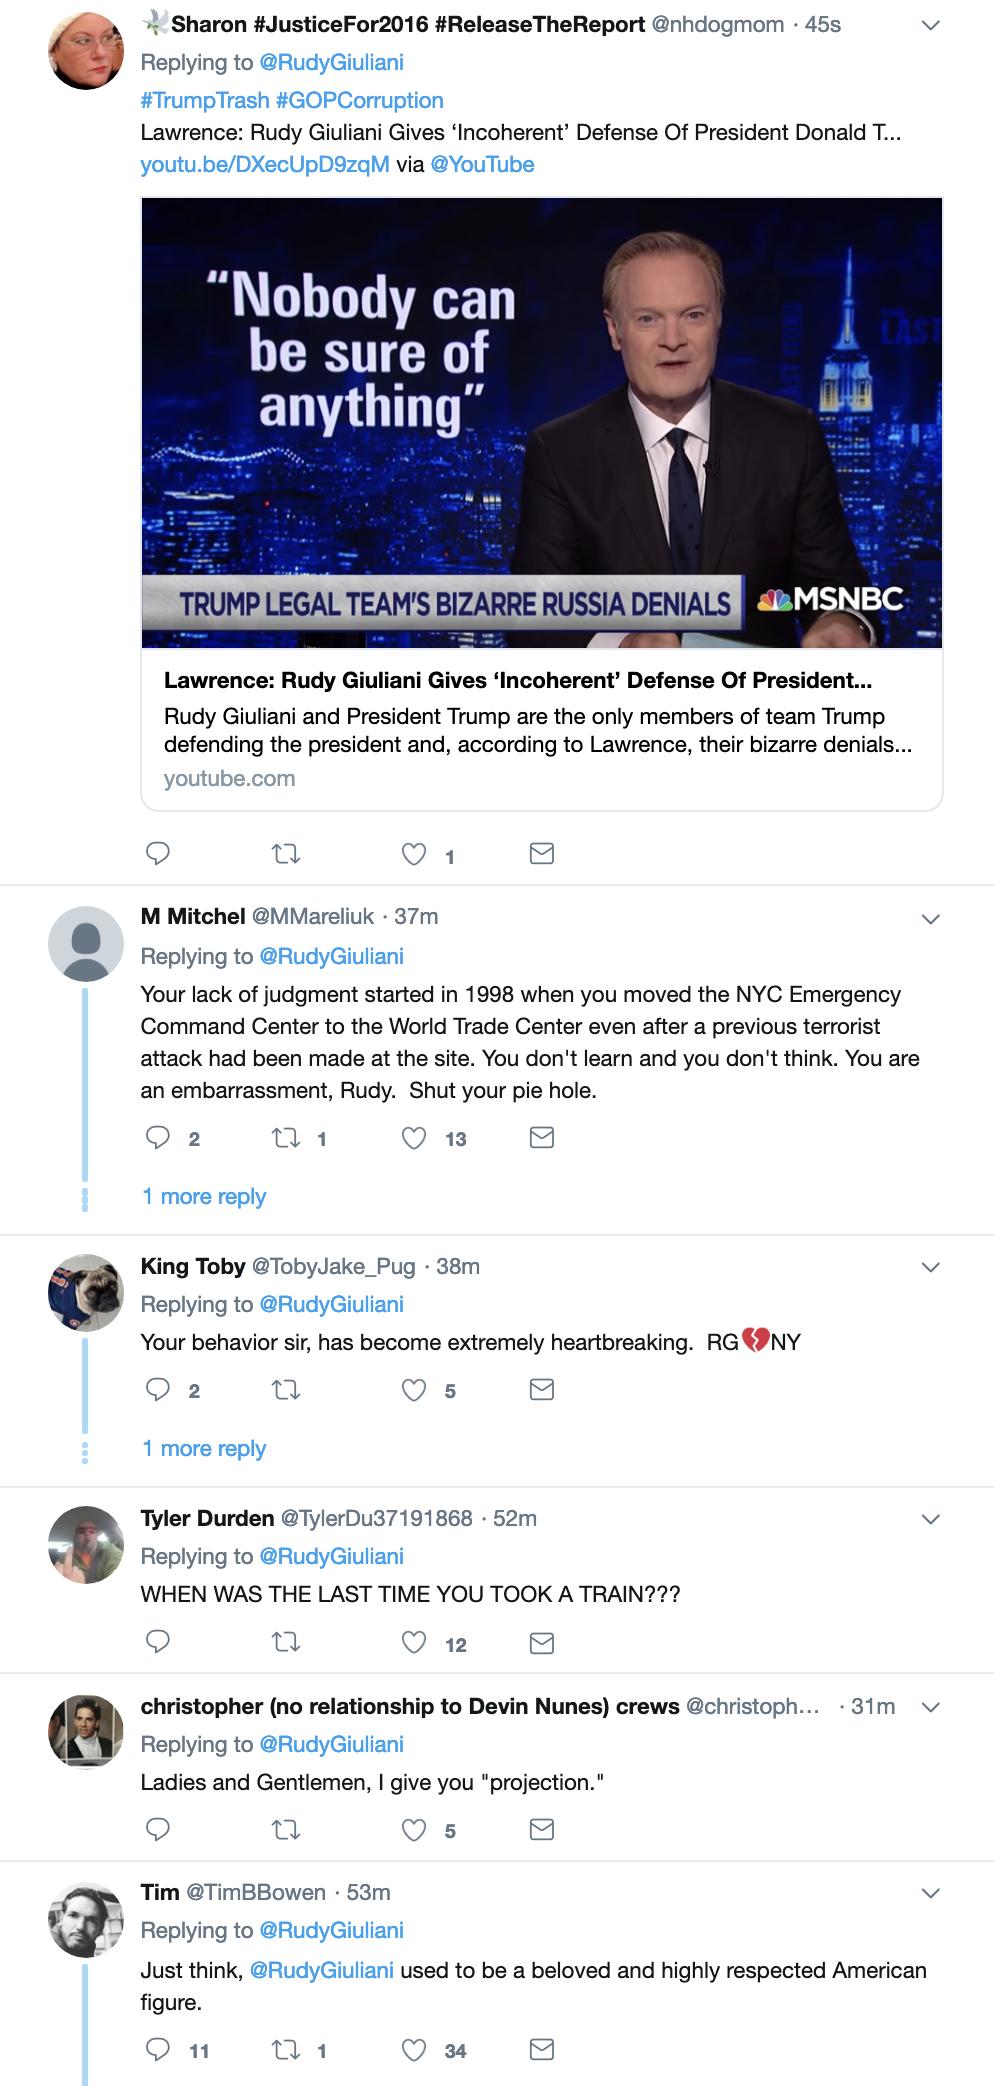 Screen-Shot-2019-04-10-at-2.32.51-PM Giuliani Creates PR Nightmare For Trump During Bizarre Twitter Meltdown Corruption Crime Donald Trump Politics Top Stories